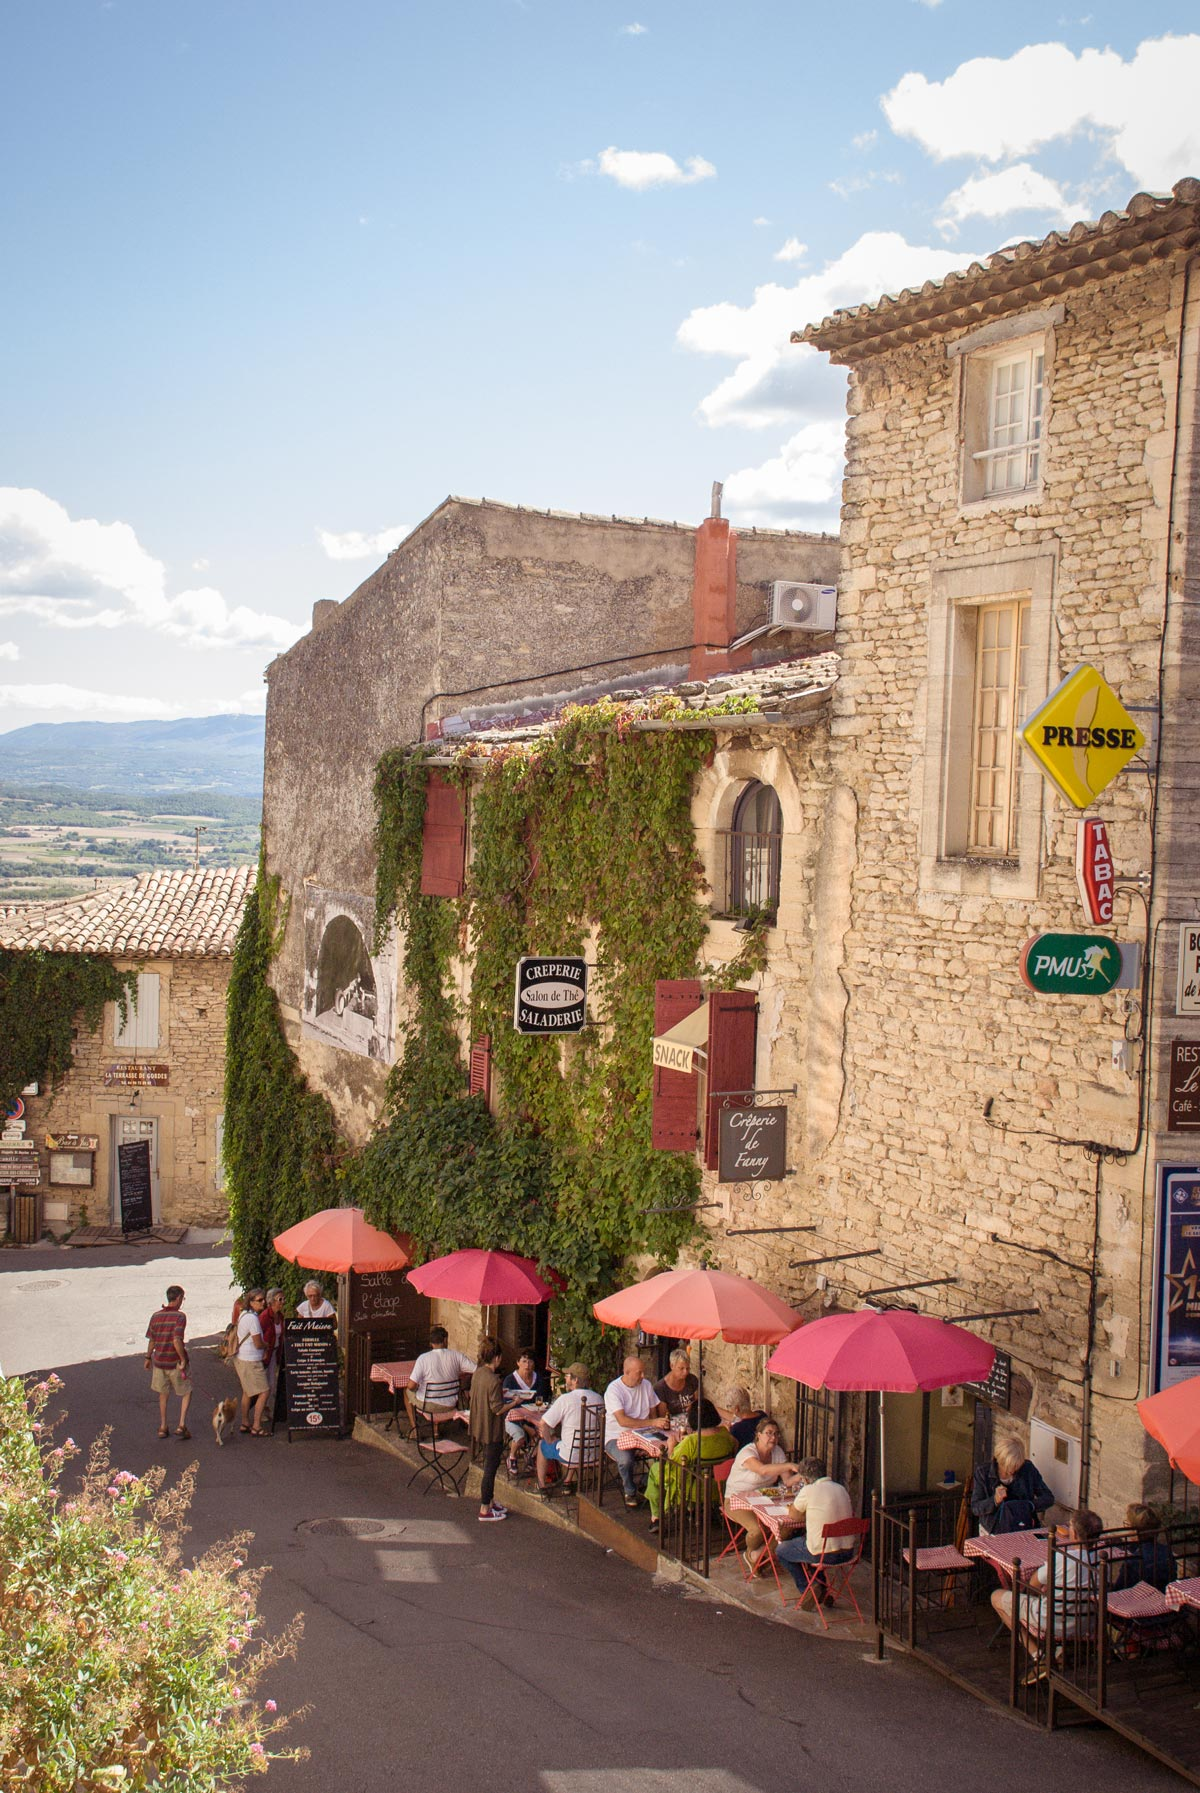 Provence-Villages-South-of-France.-Provence-Luberon.-Gordes-cafes.-Eating-in-Gordes